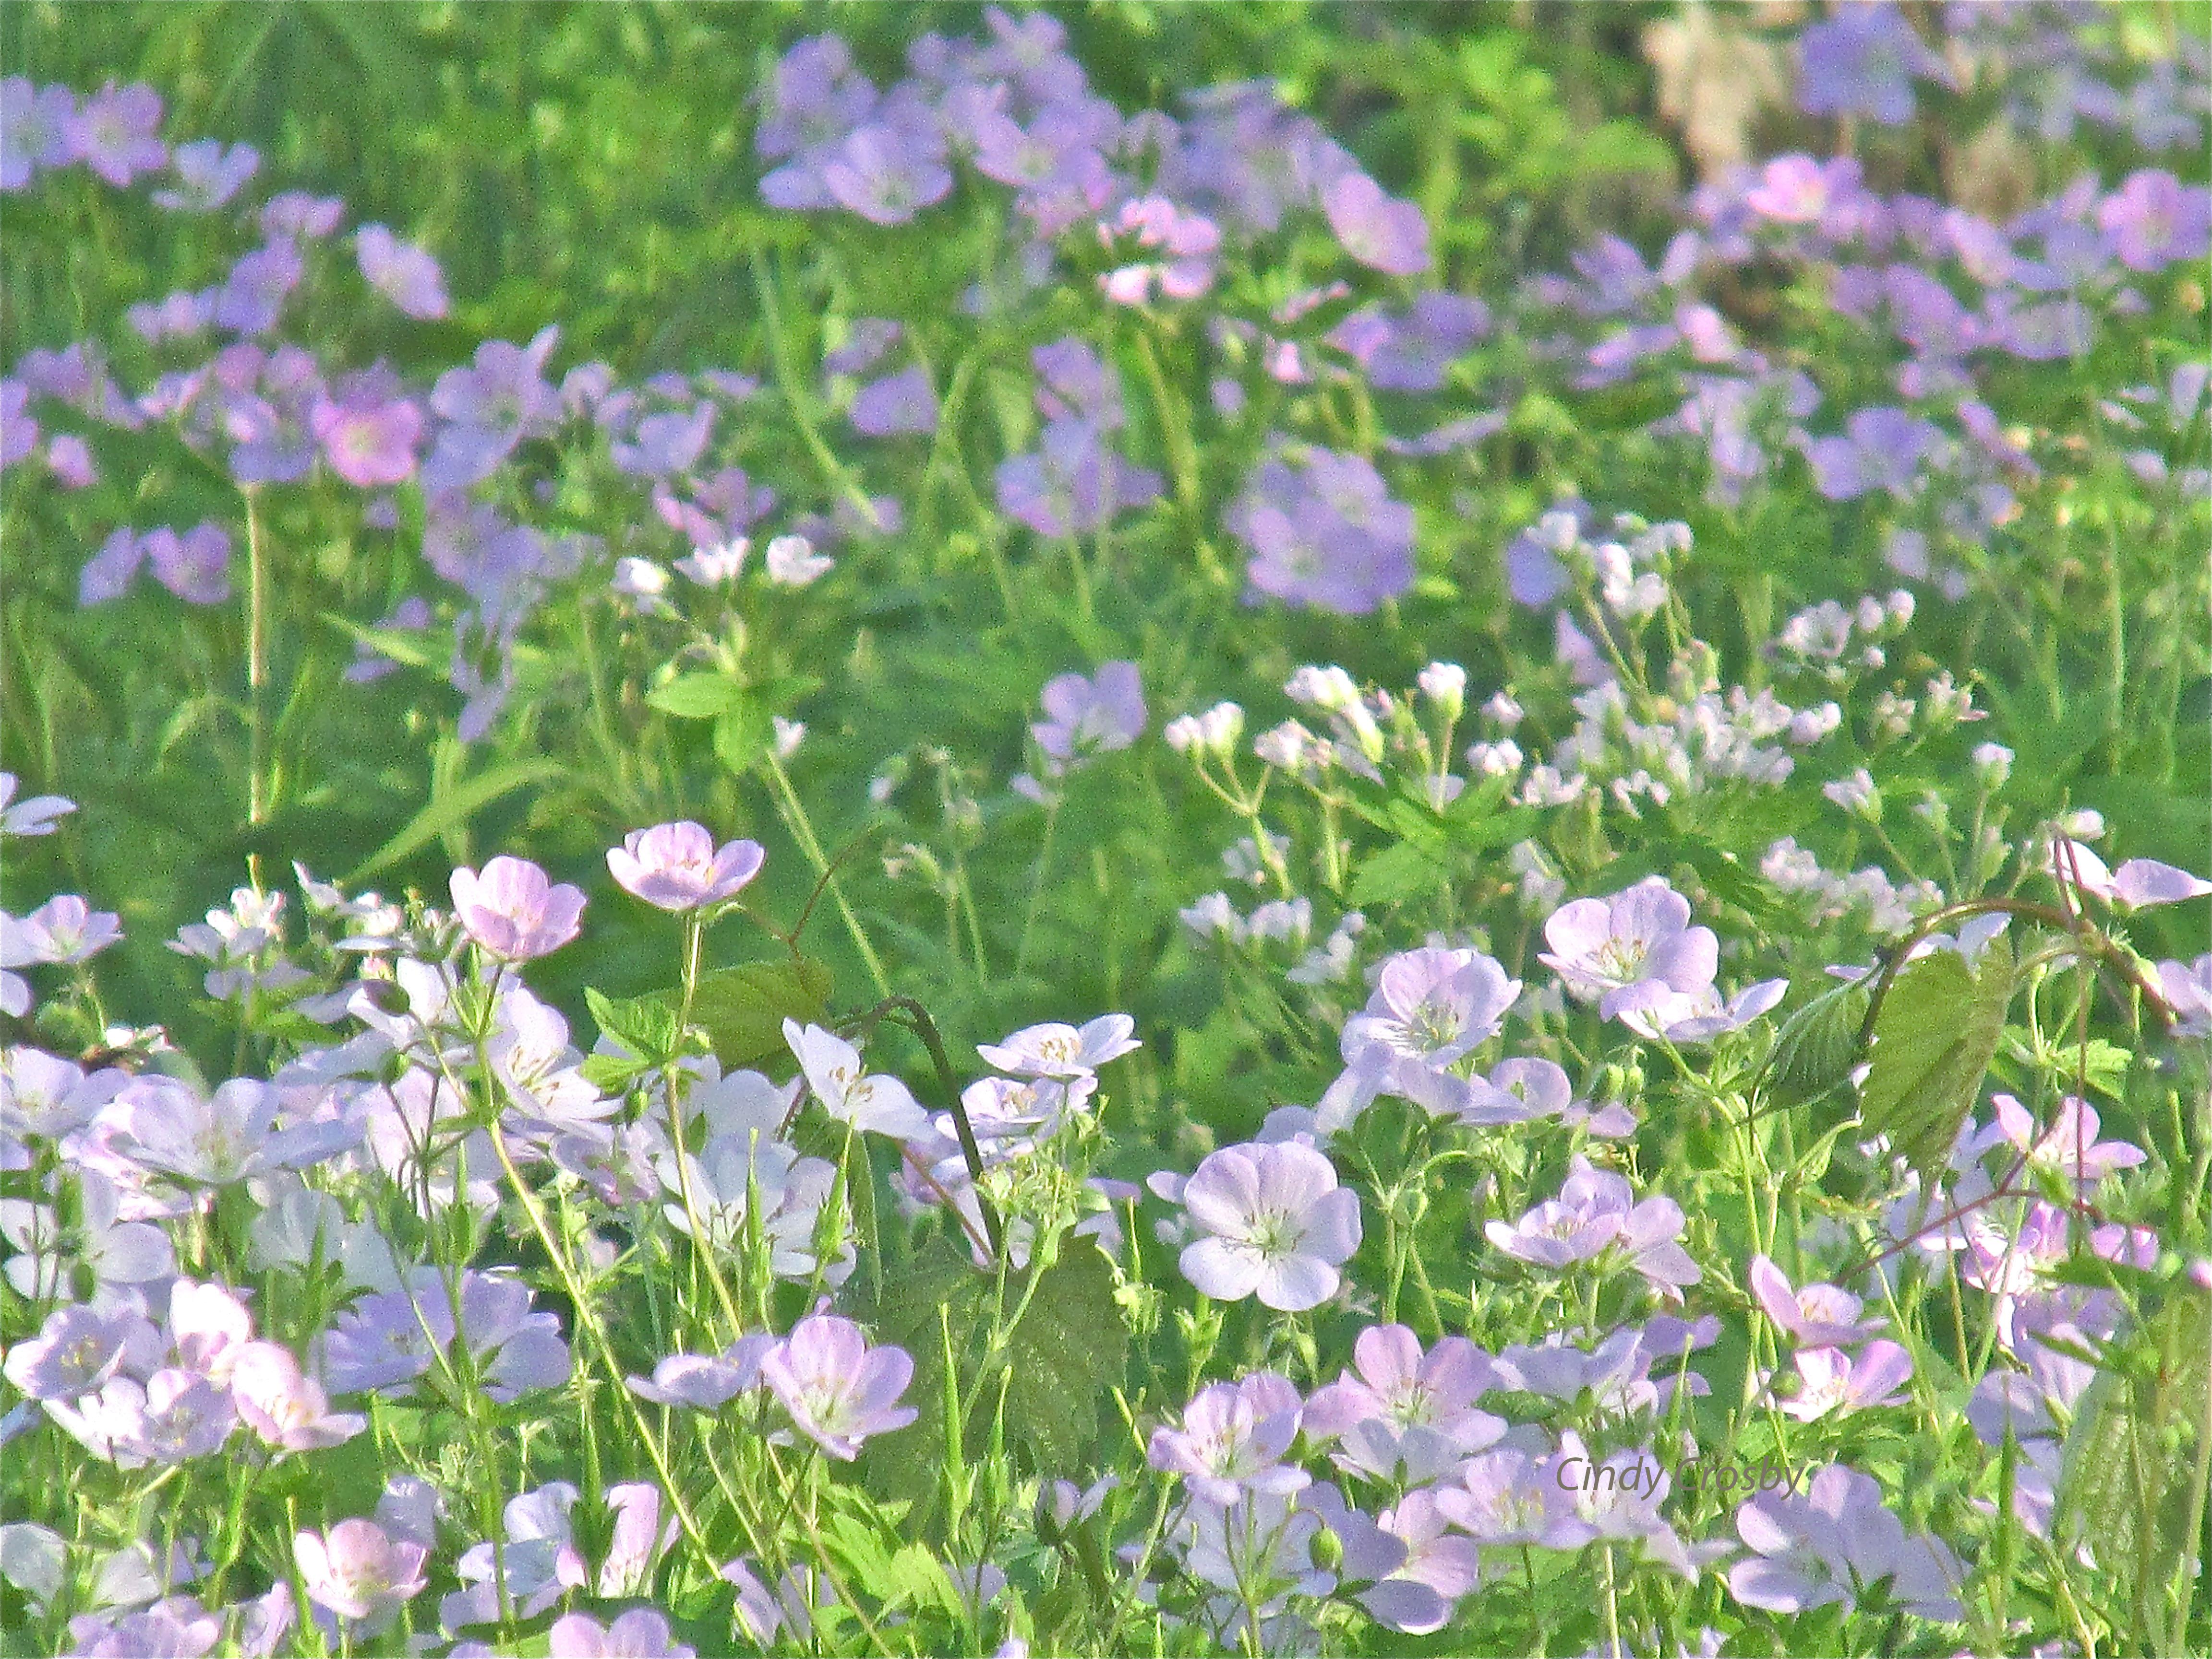 Wild geraniums MAEW2017watermark.jpg